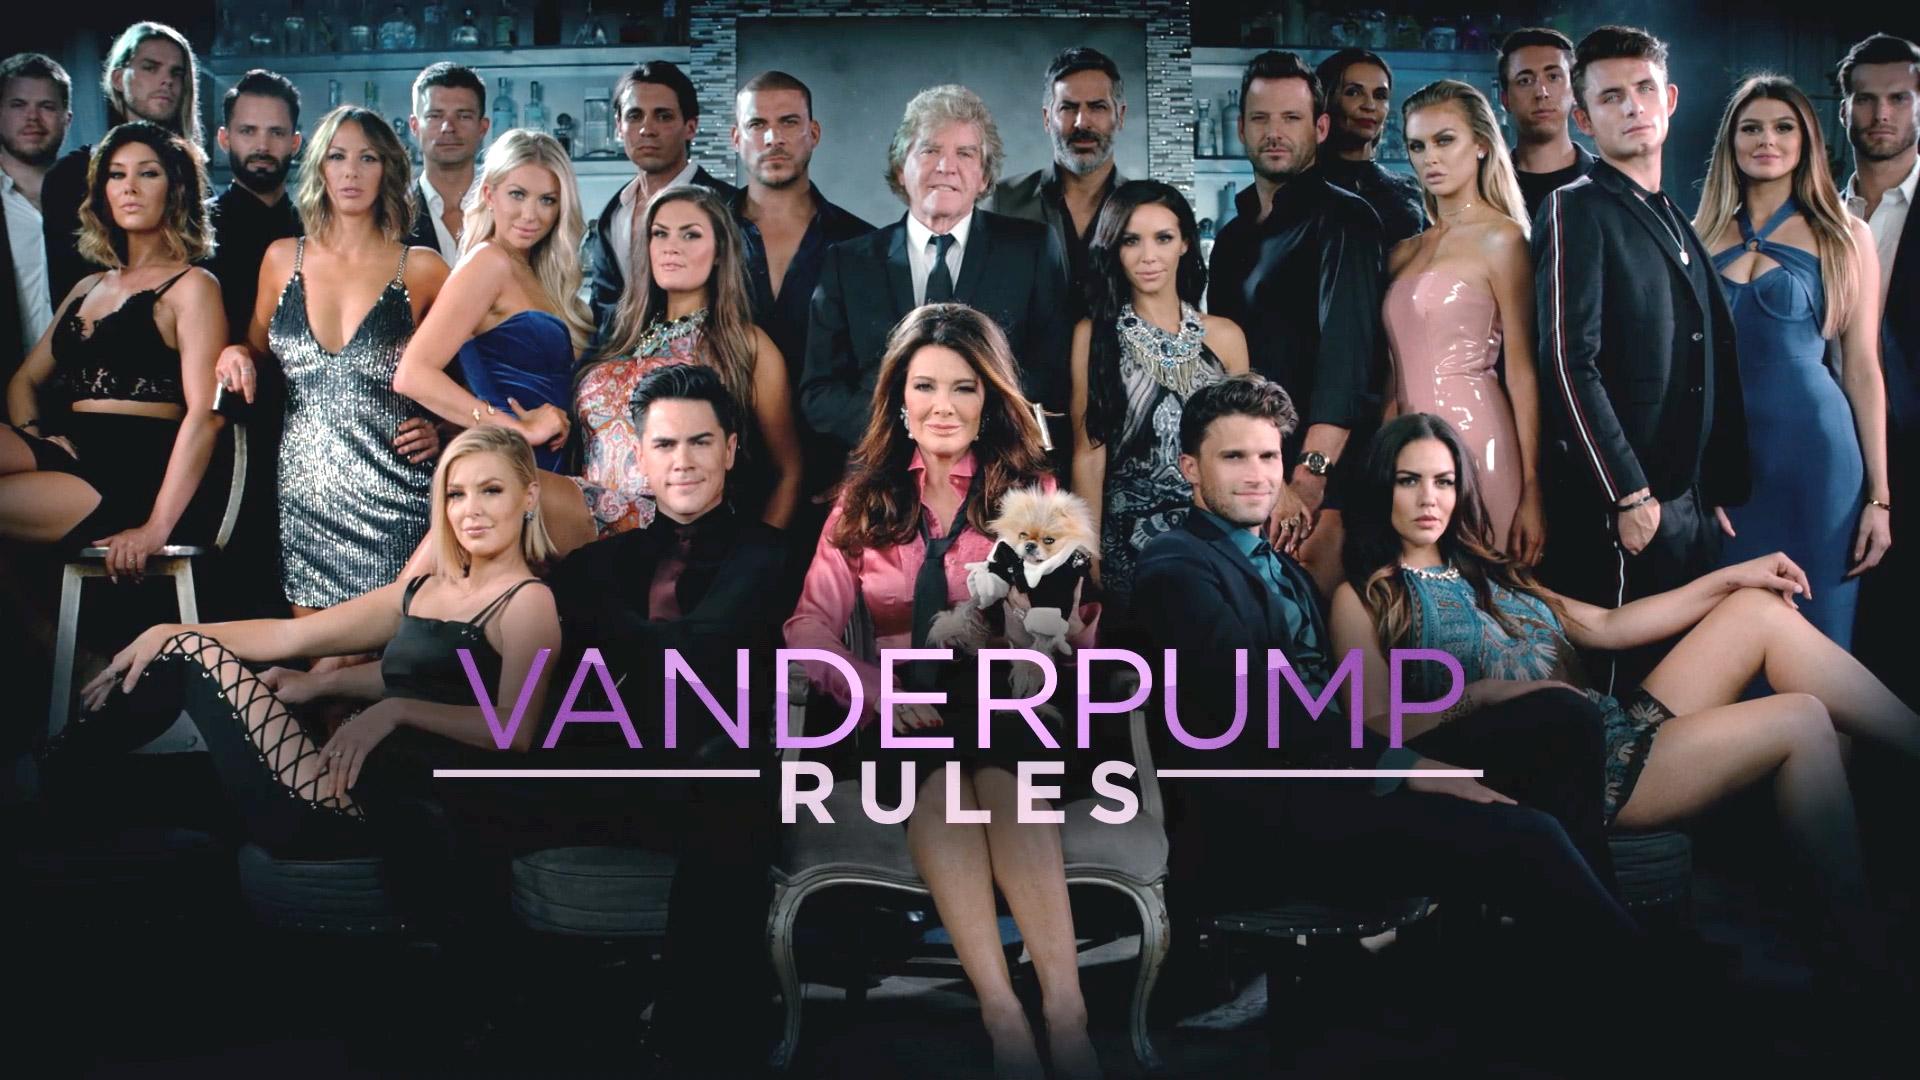 Vanderpump Rules Season 6 Opening Credits Video | The Daily Dish